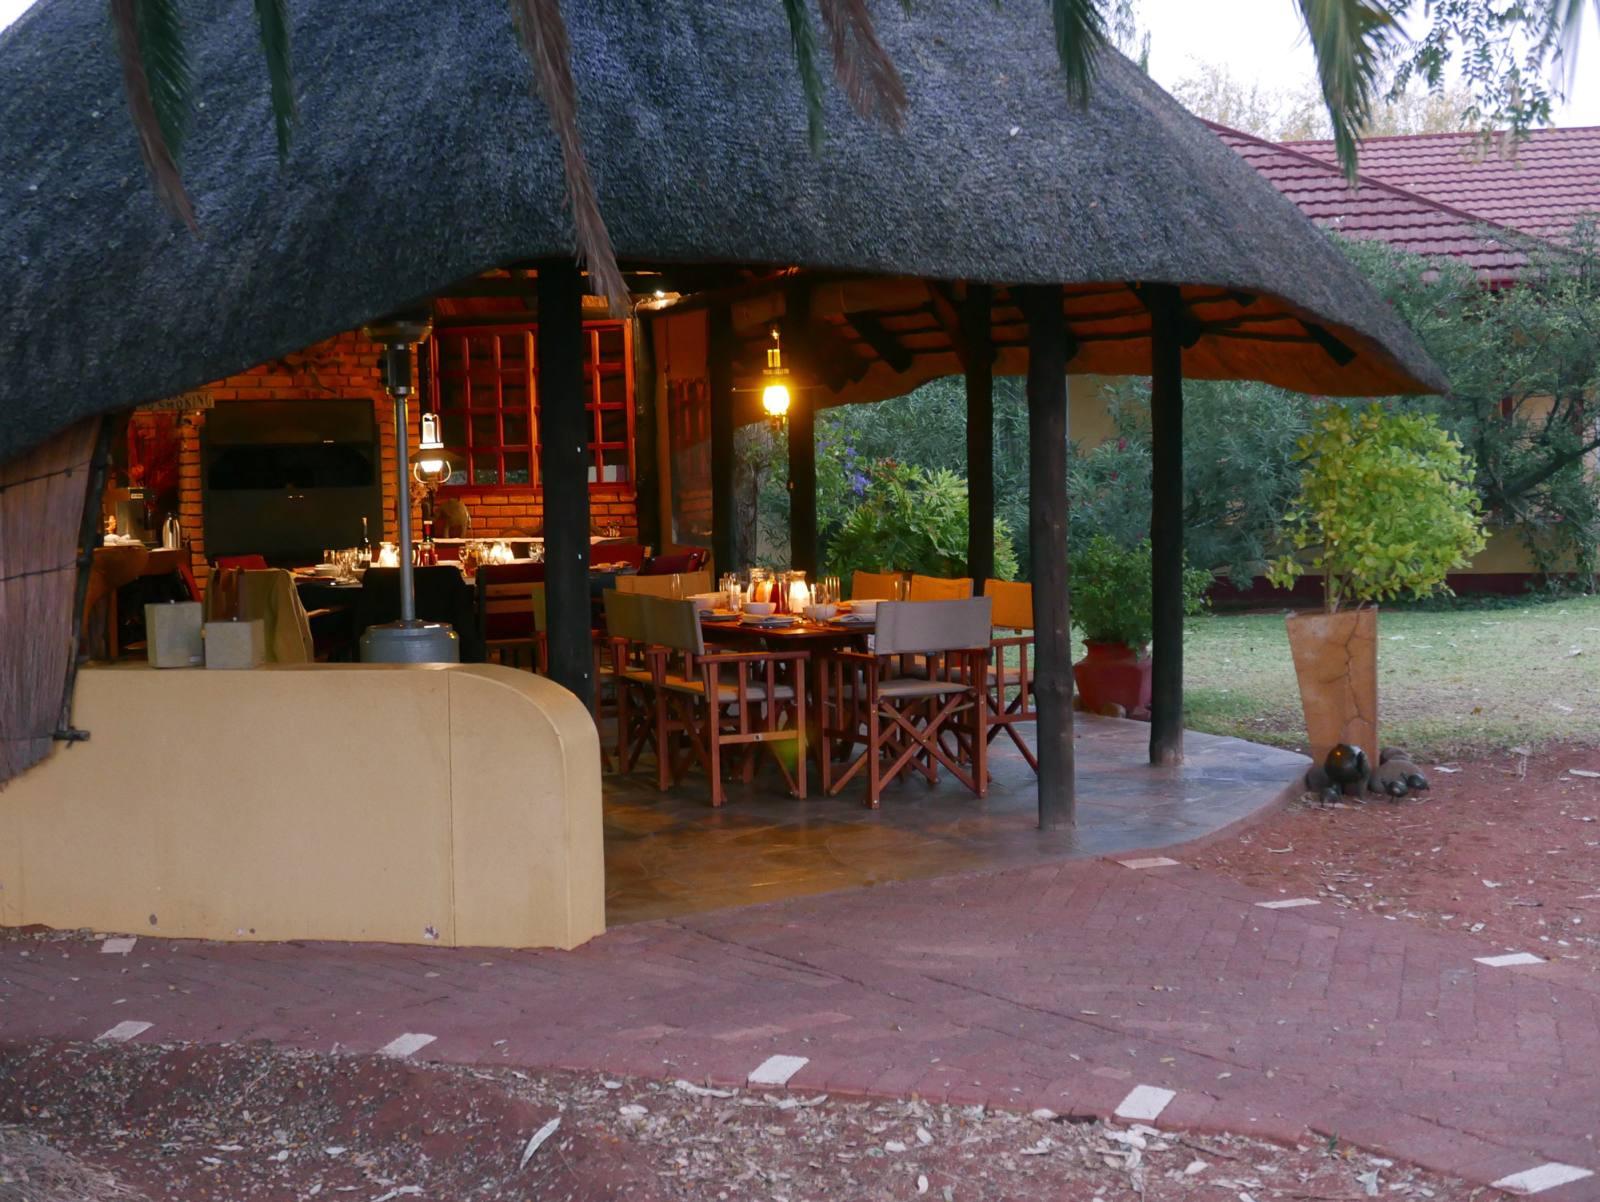 Andrea_Boldrini_Namibia_Tivoli_farm_011